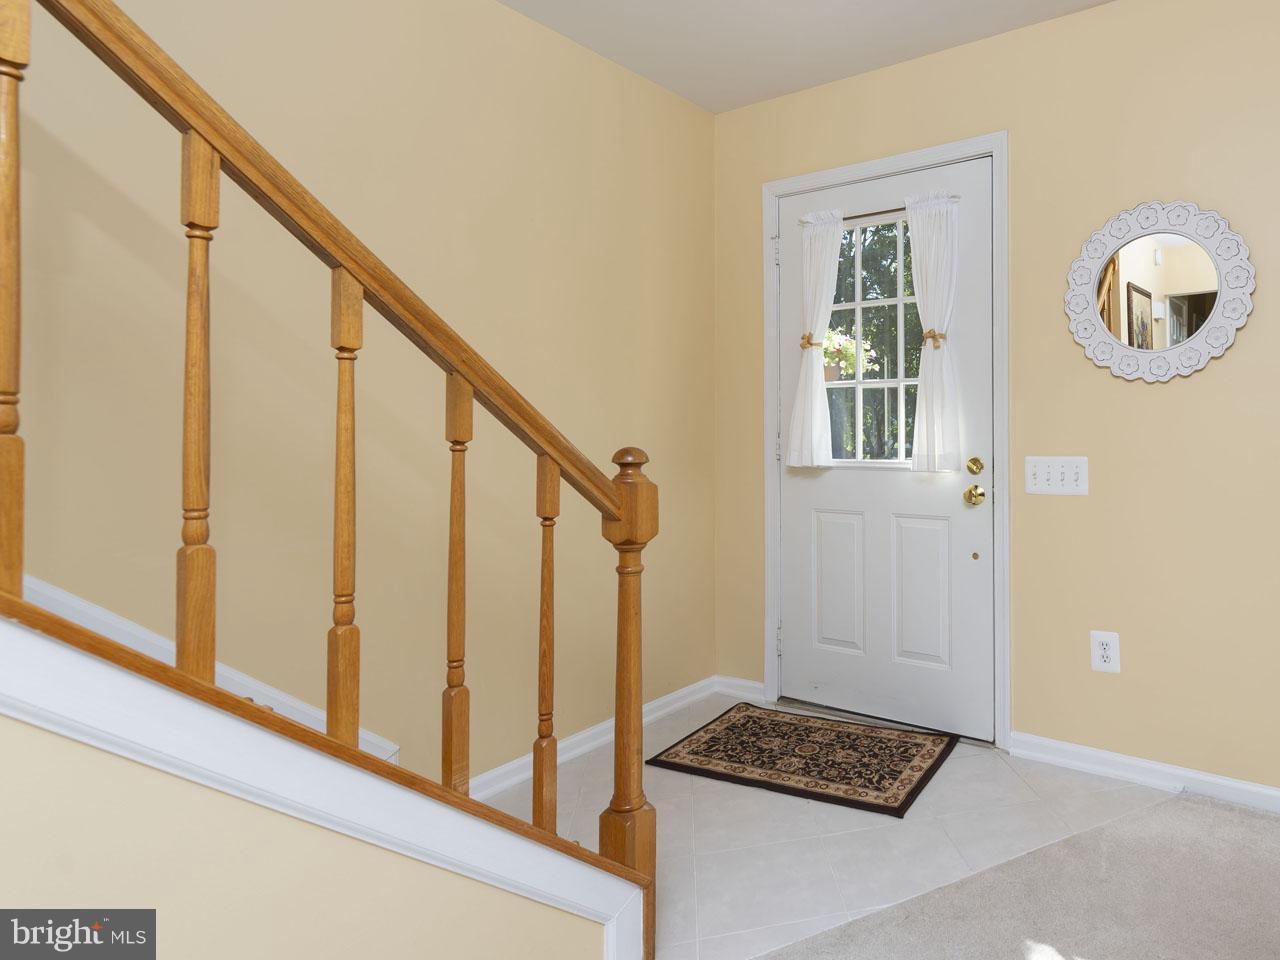 1002640508-300537944379-2021-07-22-05-00-37     Pinecrest   Alexandria Delaware Real Estate For Sale   MLS# 1002640508  - Best of Northern Virginia